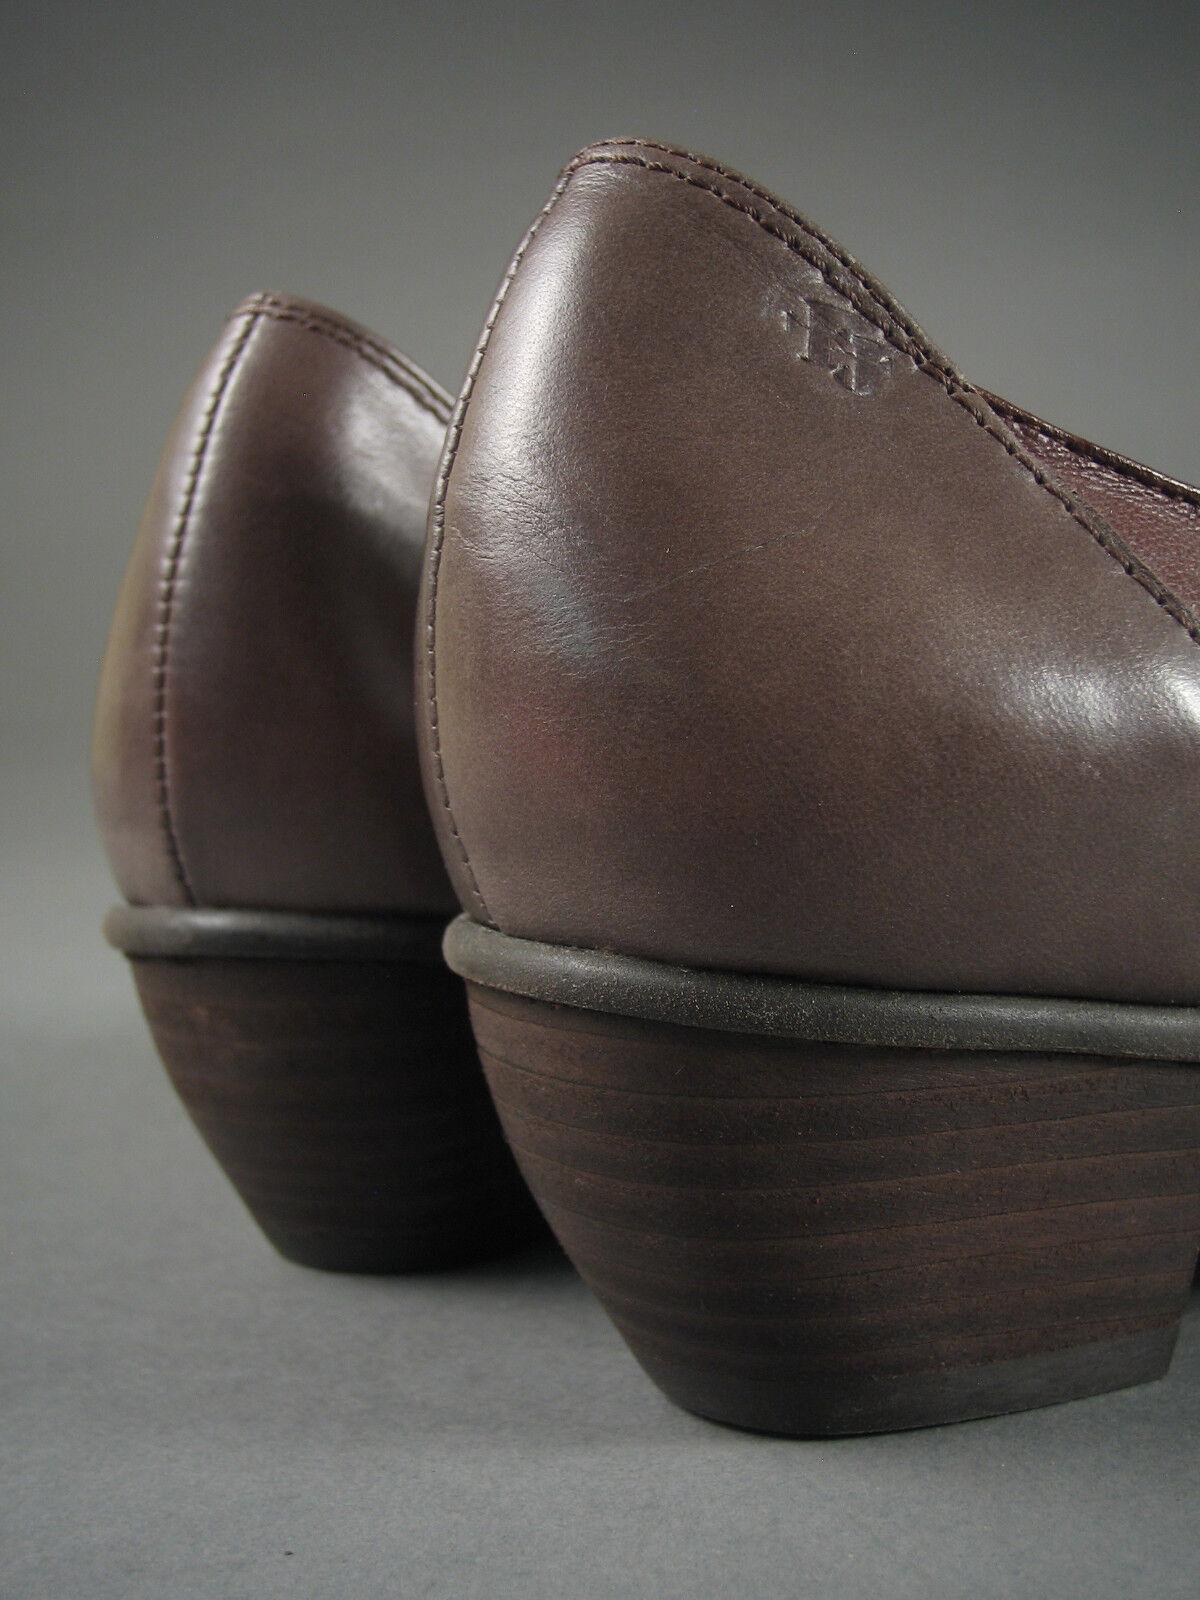 New FIDJI Brown & Gray EUR LEATHER Slip-on PUMPS Portugal Size 7-7.5 US/37 EUR Gray NIB ! 011f29